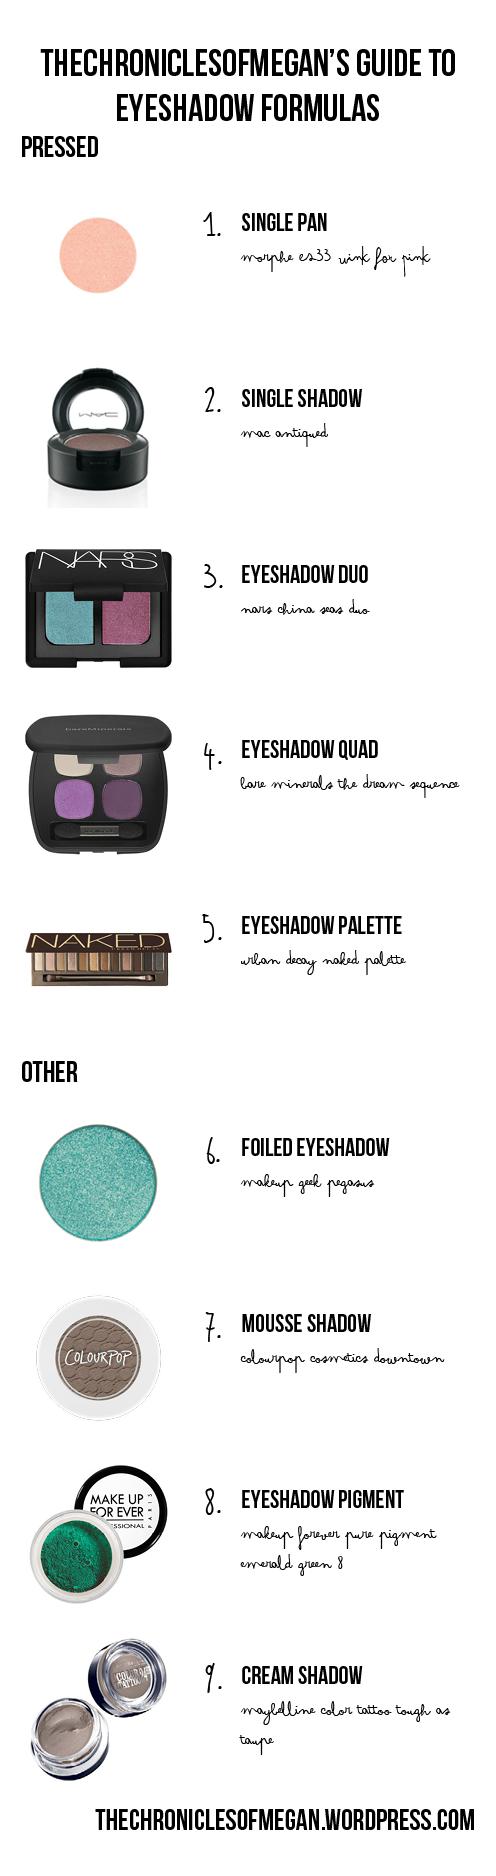 eyeshadowformulas